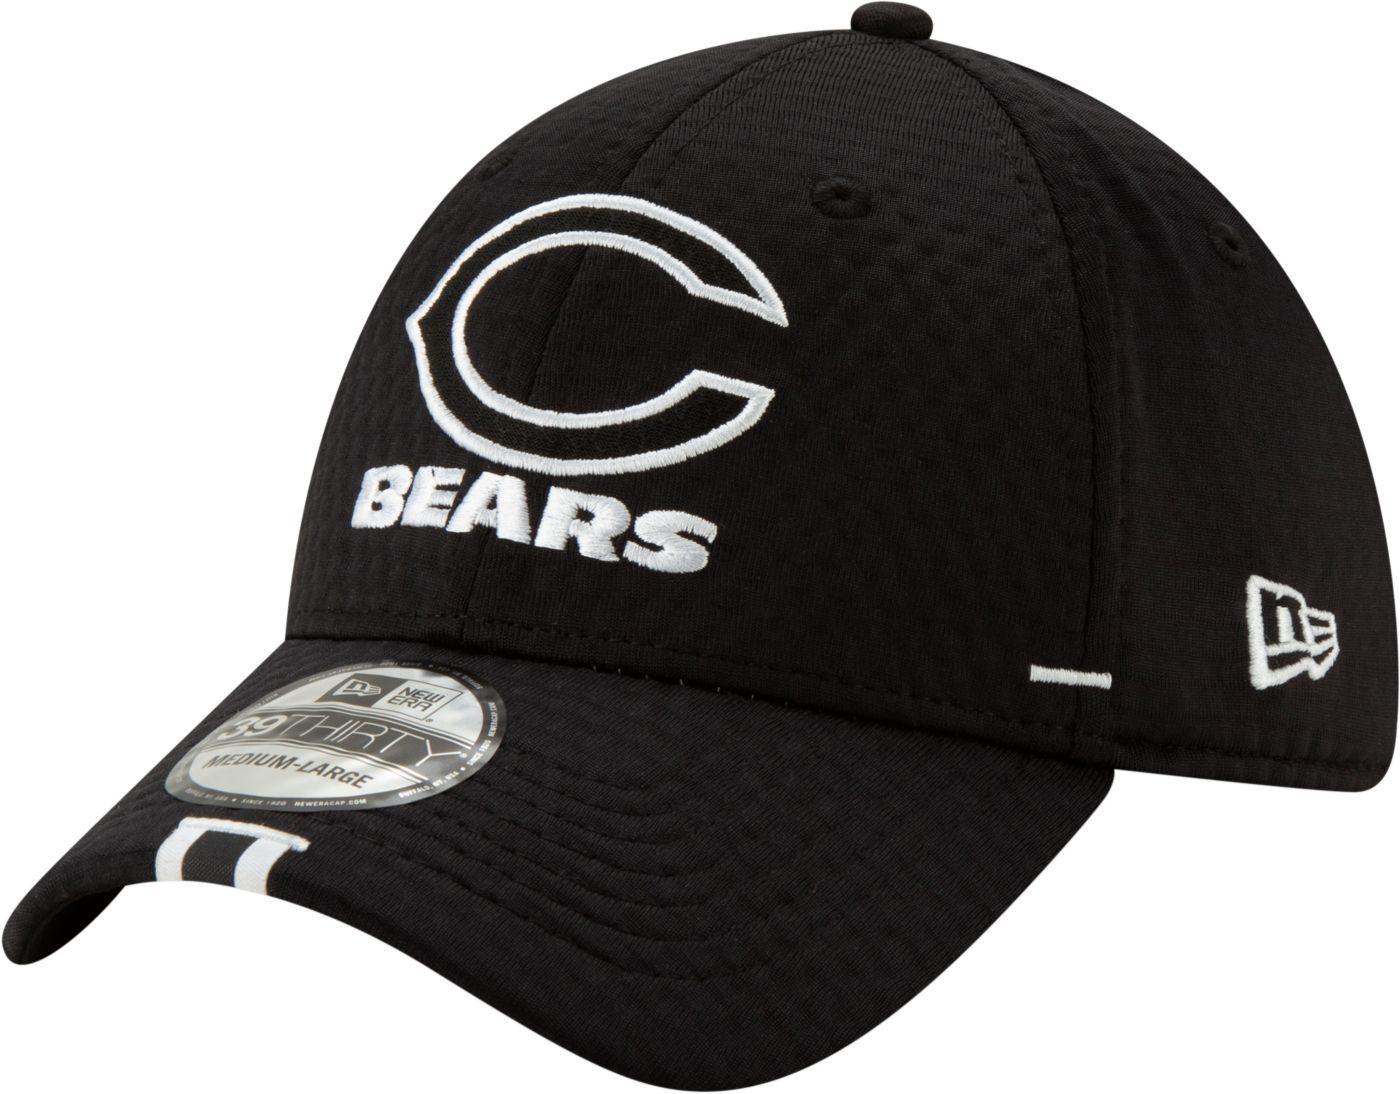 New Era Men's Chicago Bears Sideline Training Camp 39Thirty Stretch Fit Black Hat